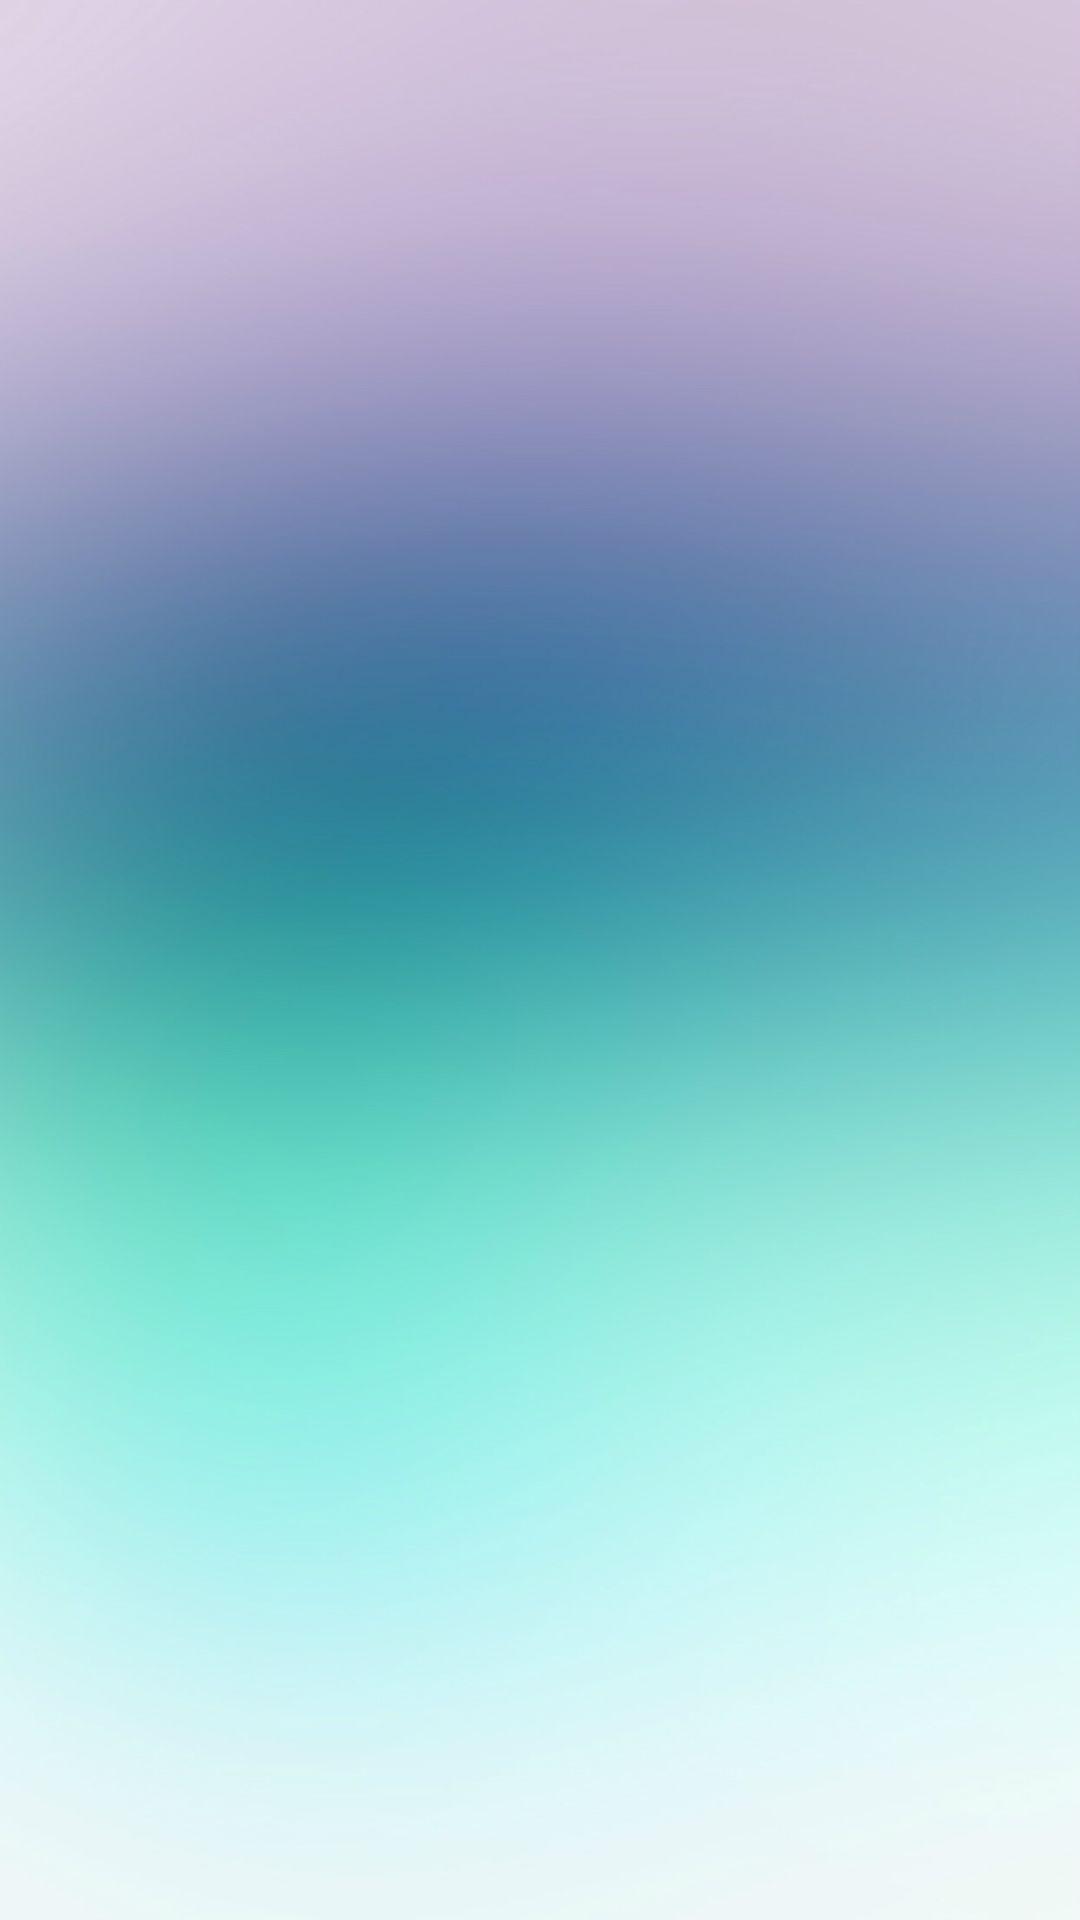 Violet, Blue, Light Teal Gradation | Color Hues in 2019 | Ombre wallpaper iphone, Blue wallpaper ...